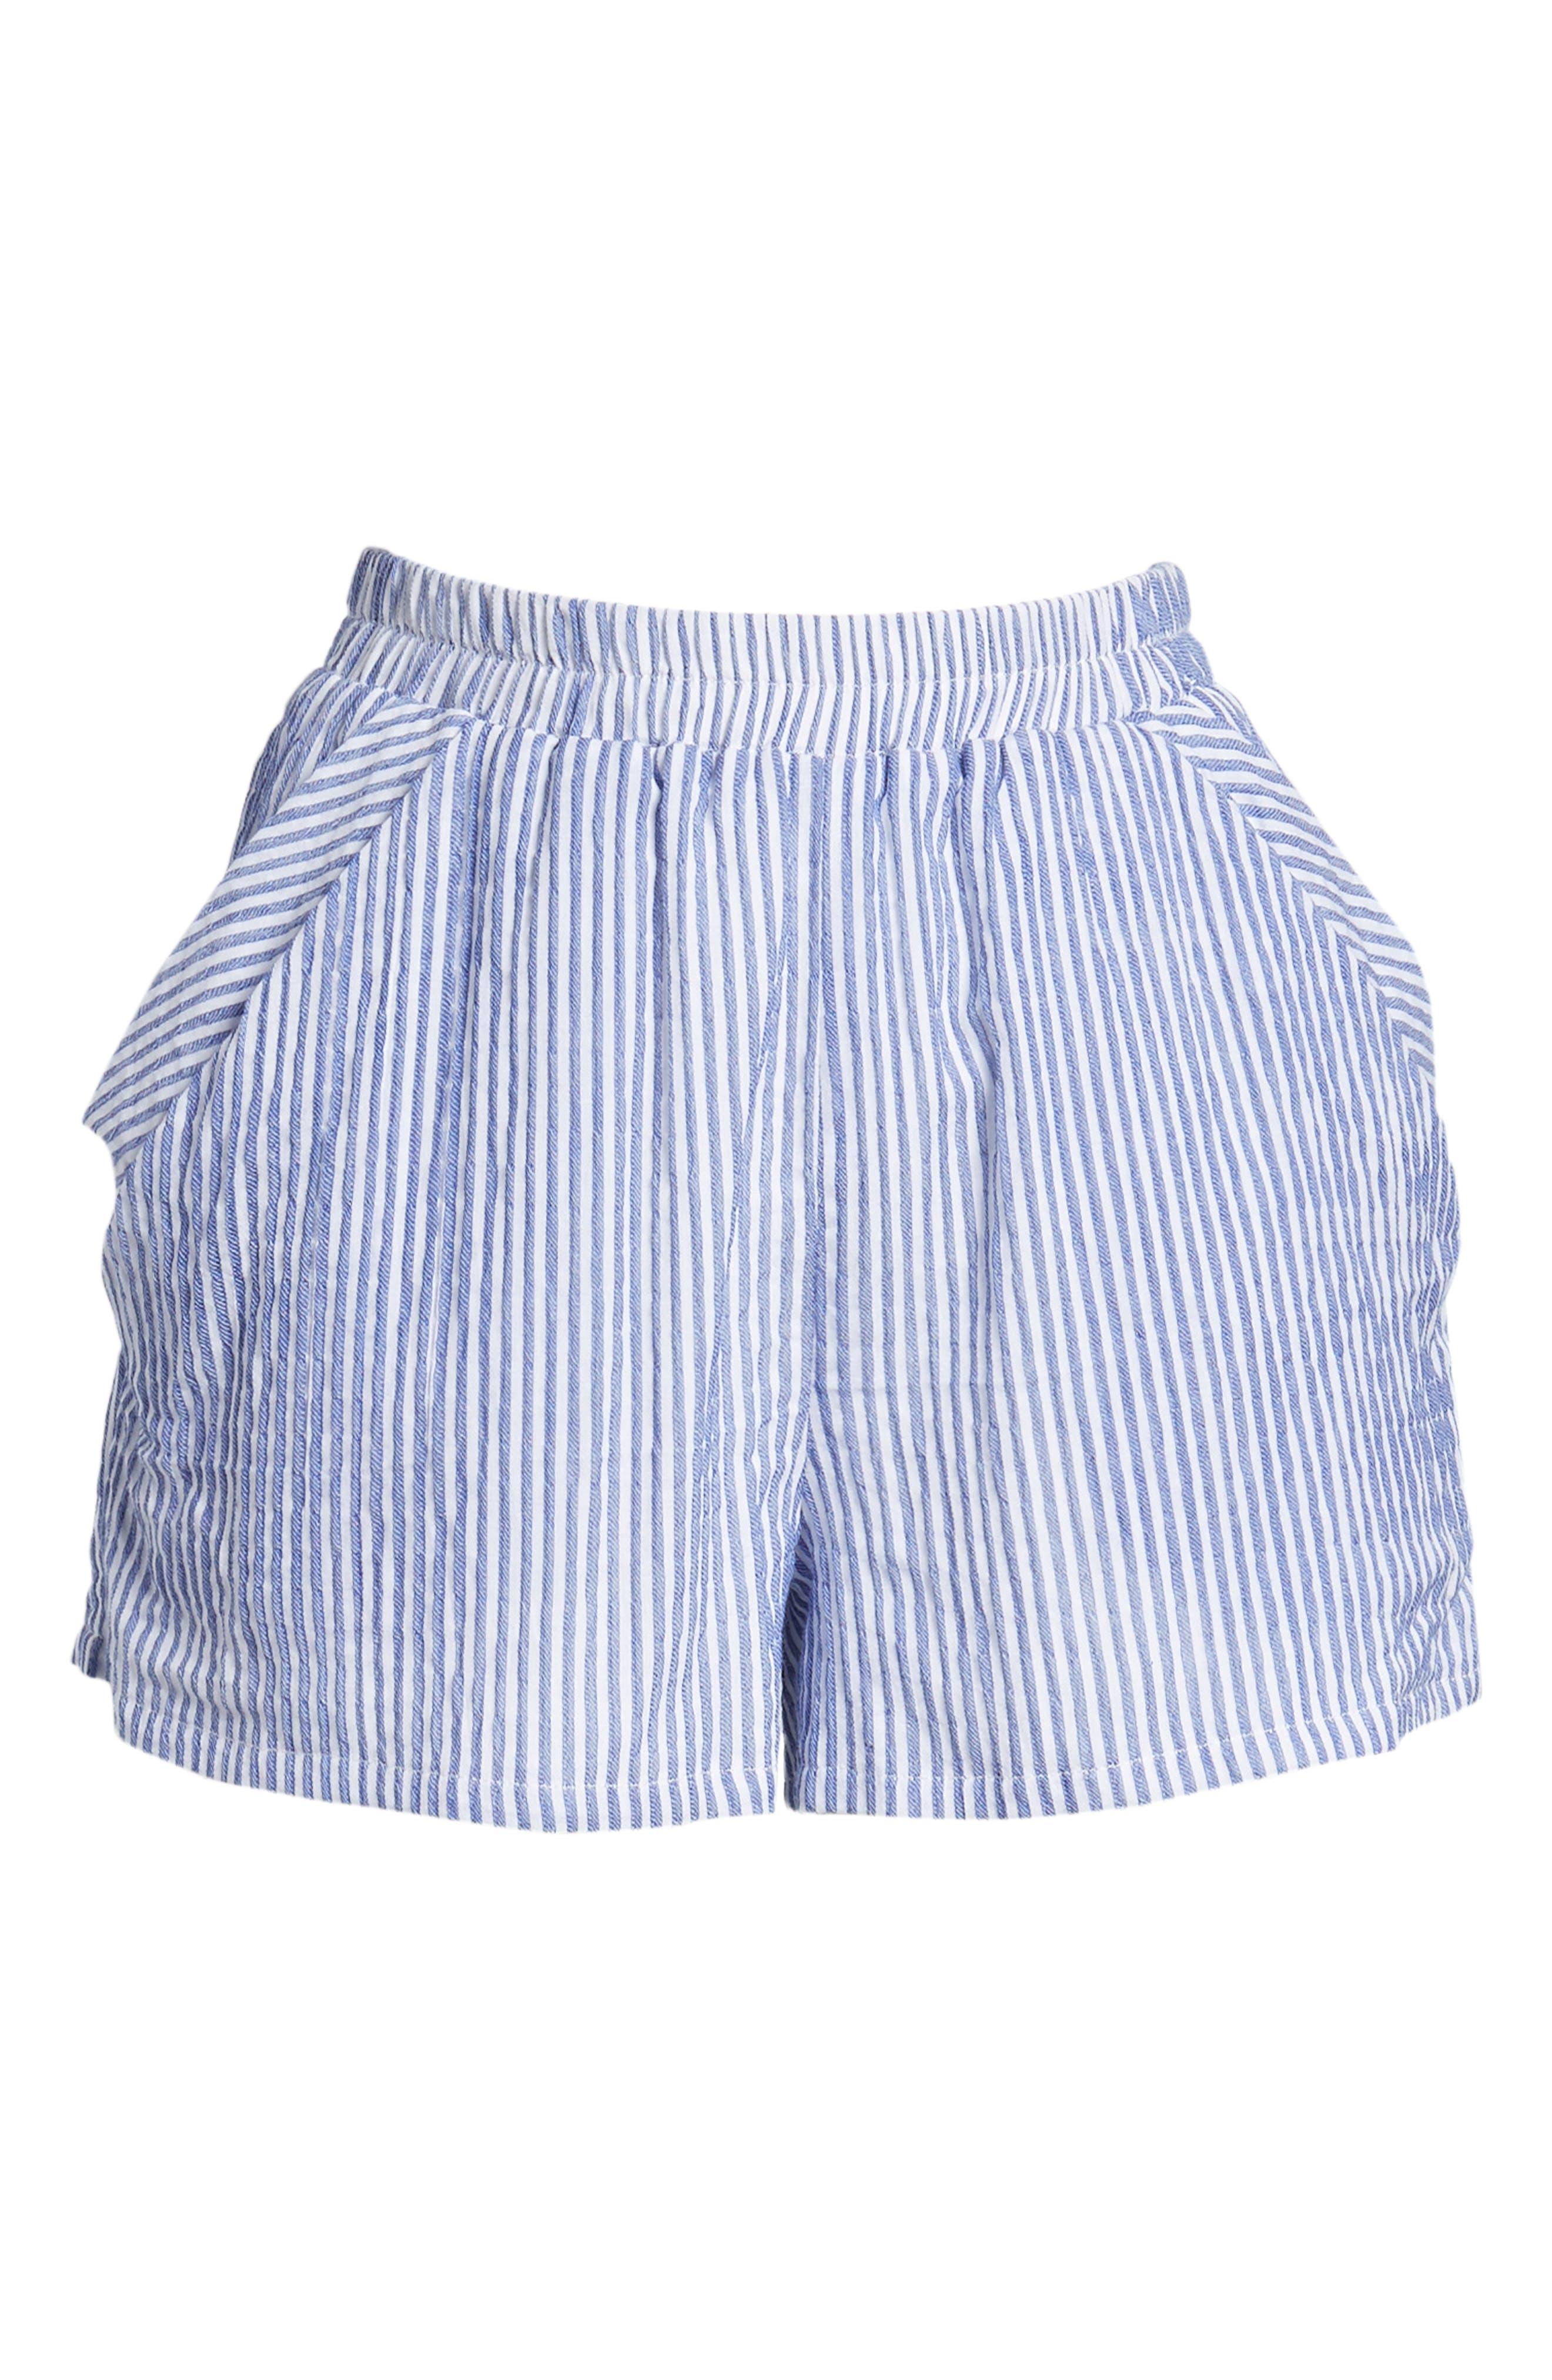 Bishop + Young Stripe Shorts,                             Alternate thumbnail 6, color,                             400